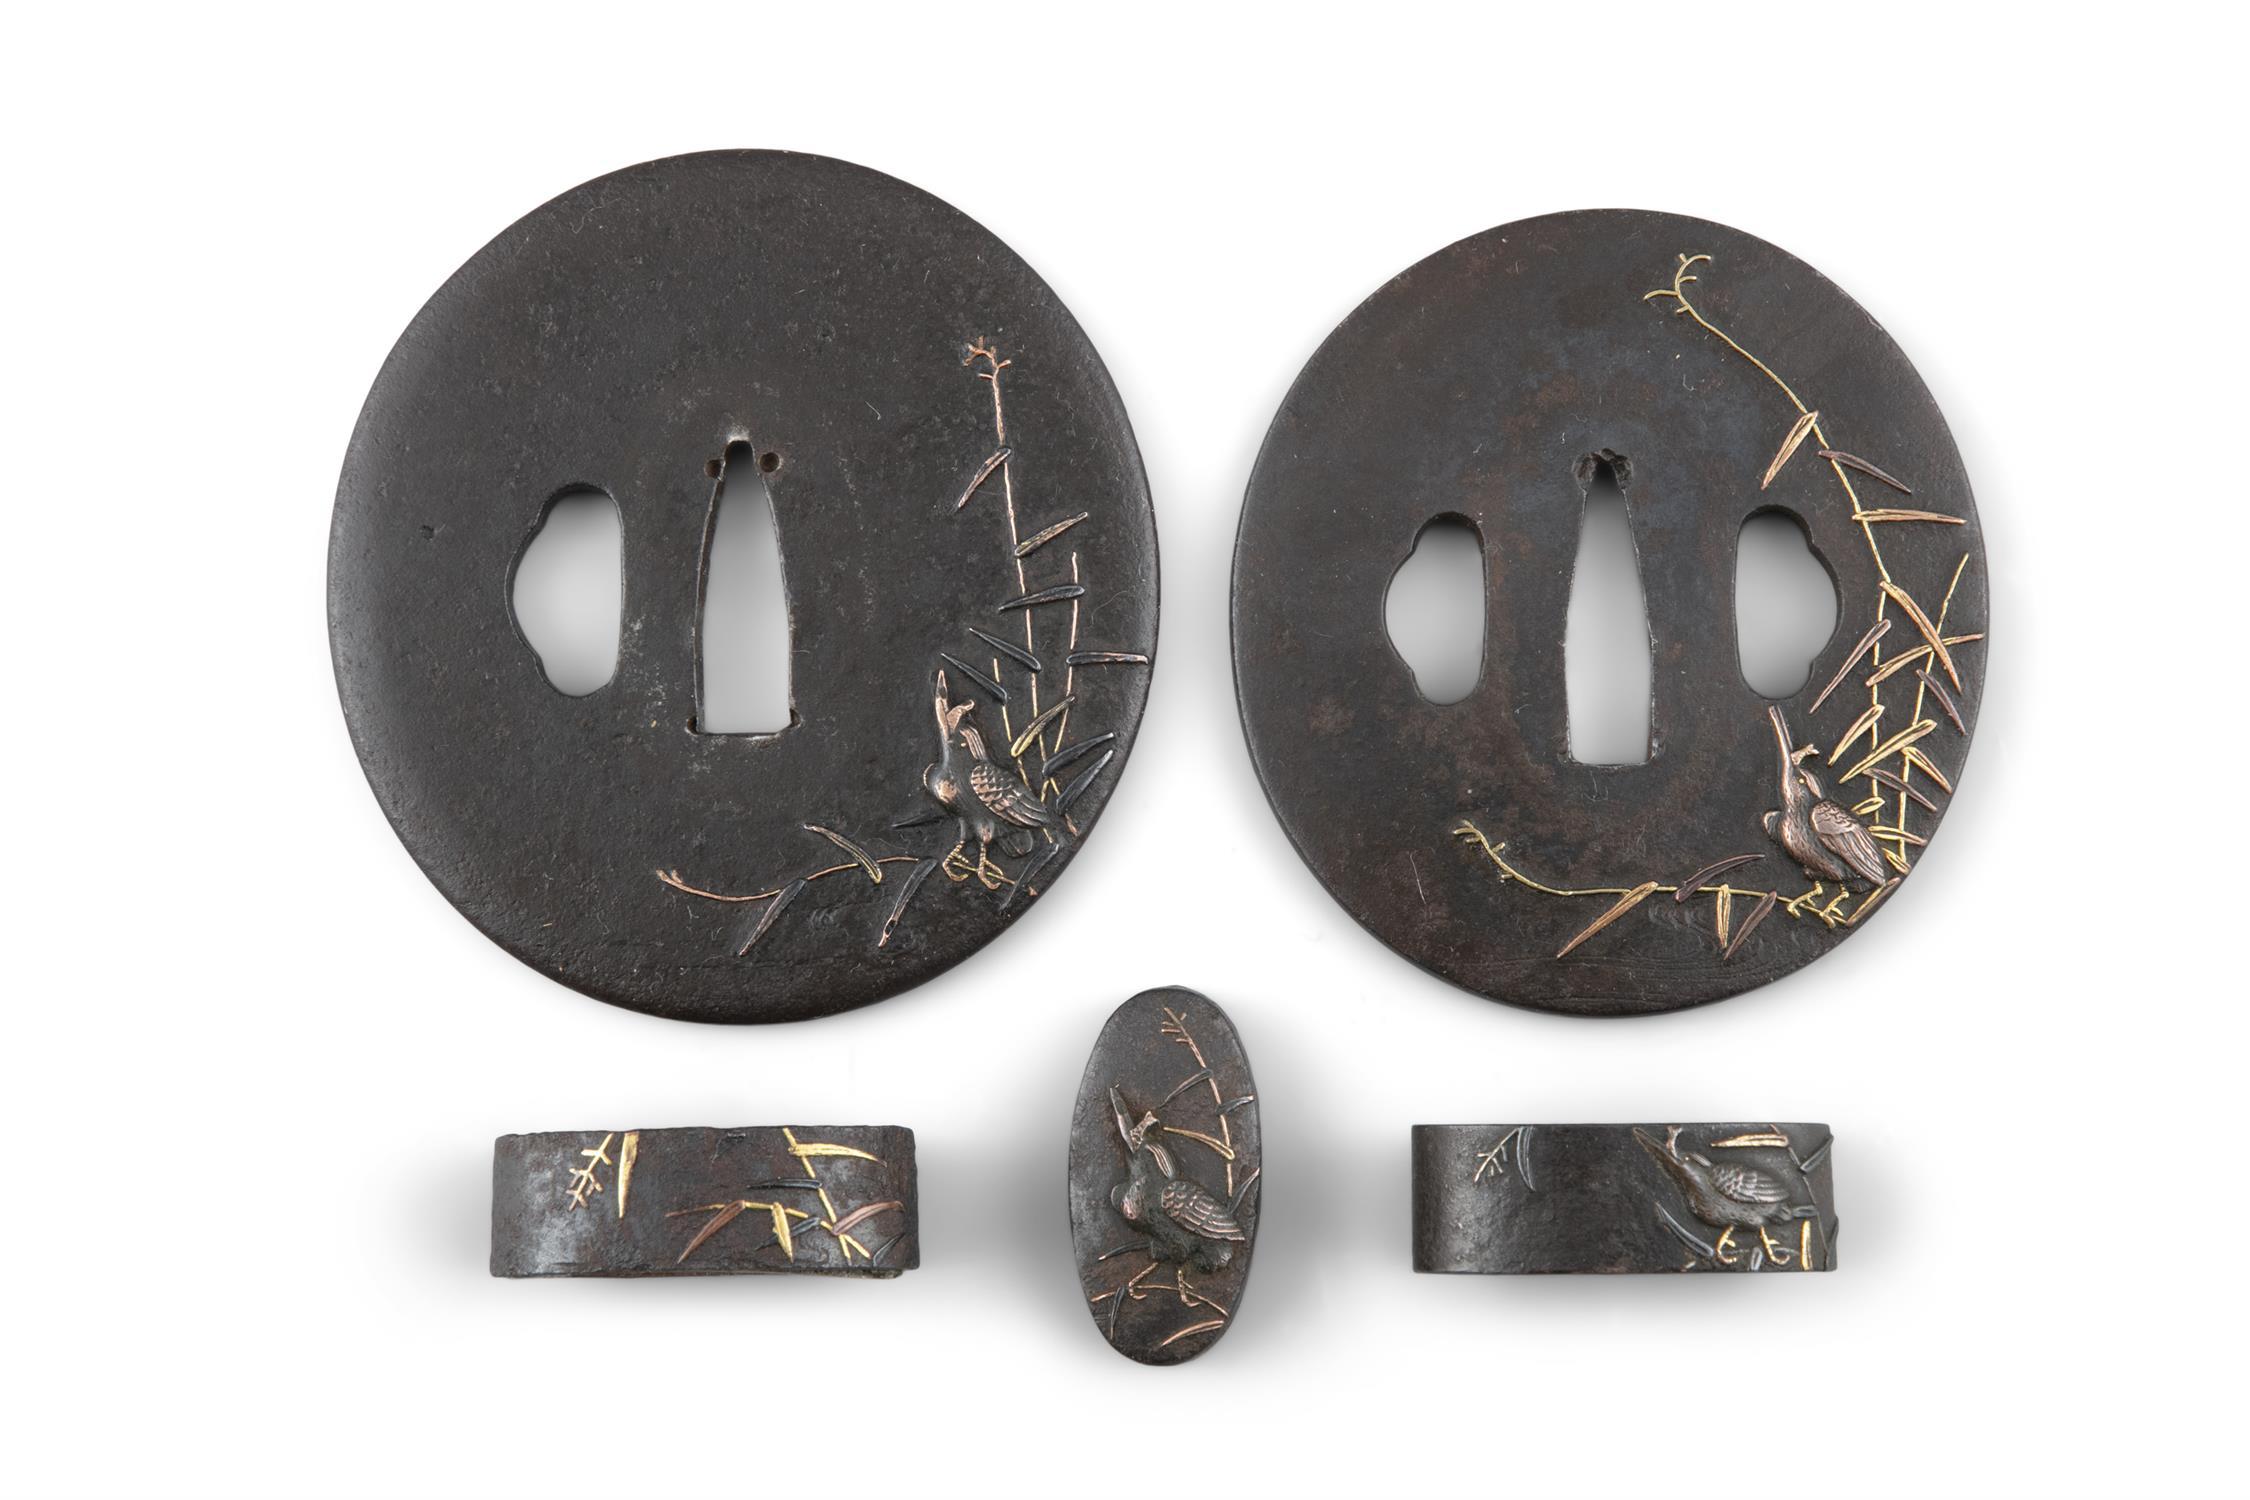 A PAIR OF DAISHO TSUBAS Japan, Edo period Both of naga maru gata type, for a daïsho (twin katana and - Image 4 of 6